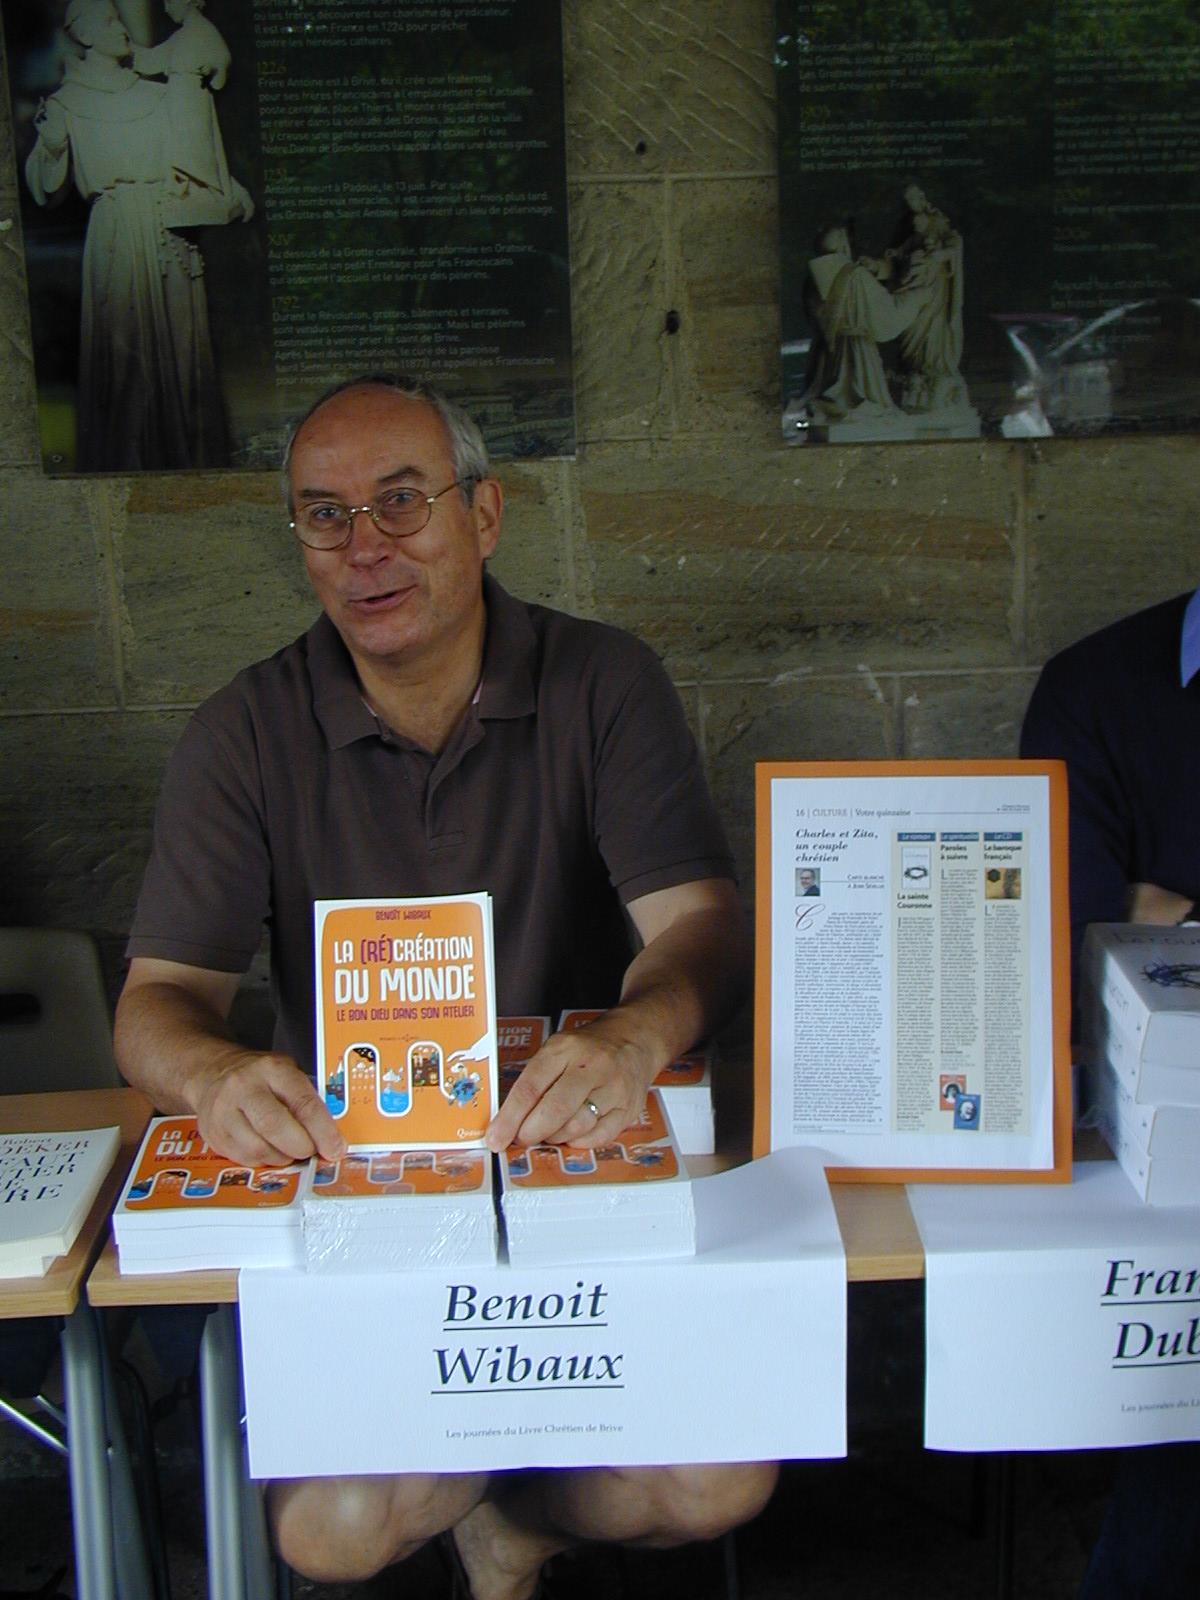 Benoit Vibaux